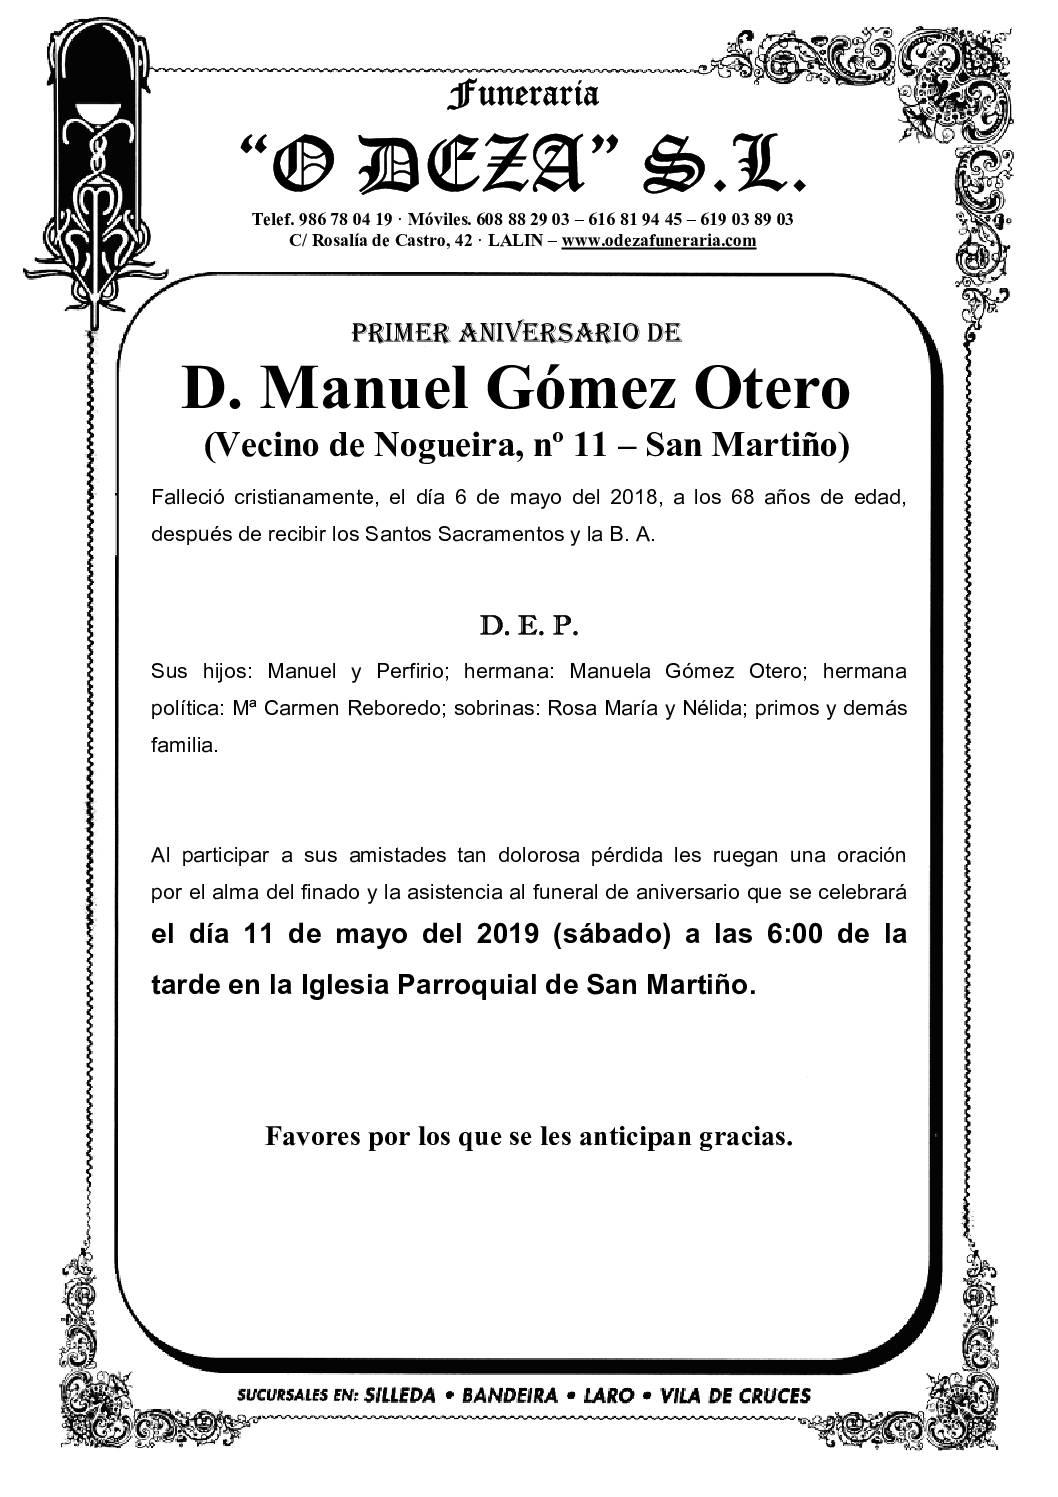 D. MANUEL GÓMEZ OTERO